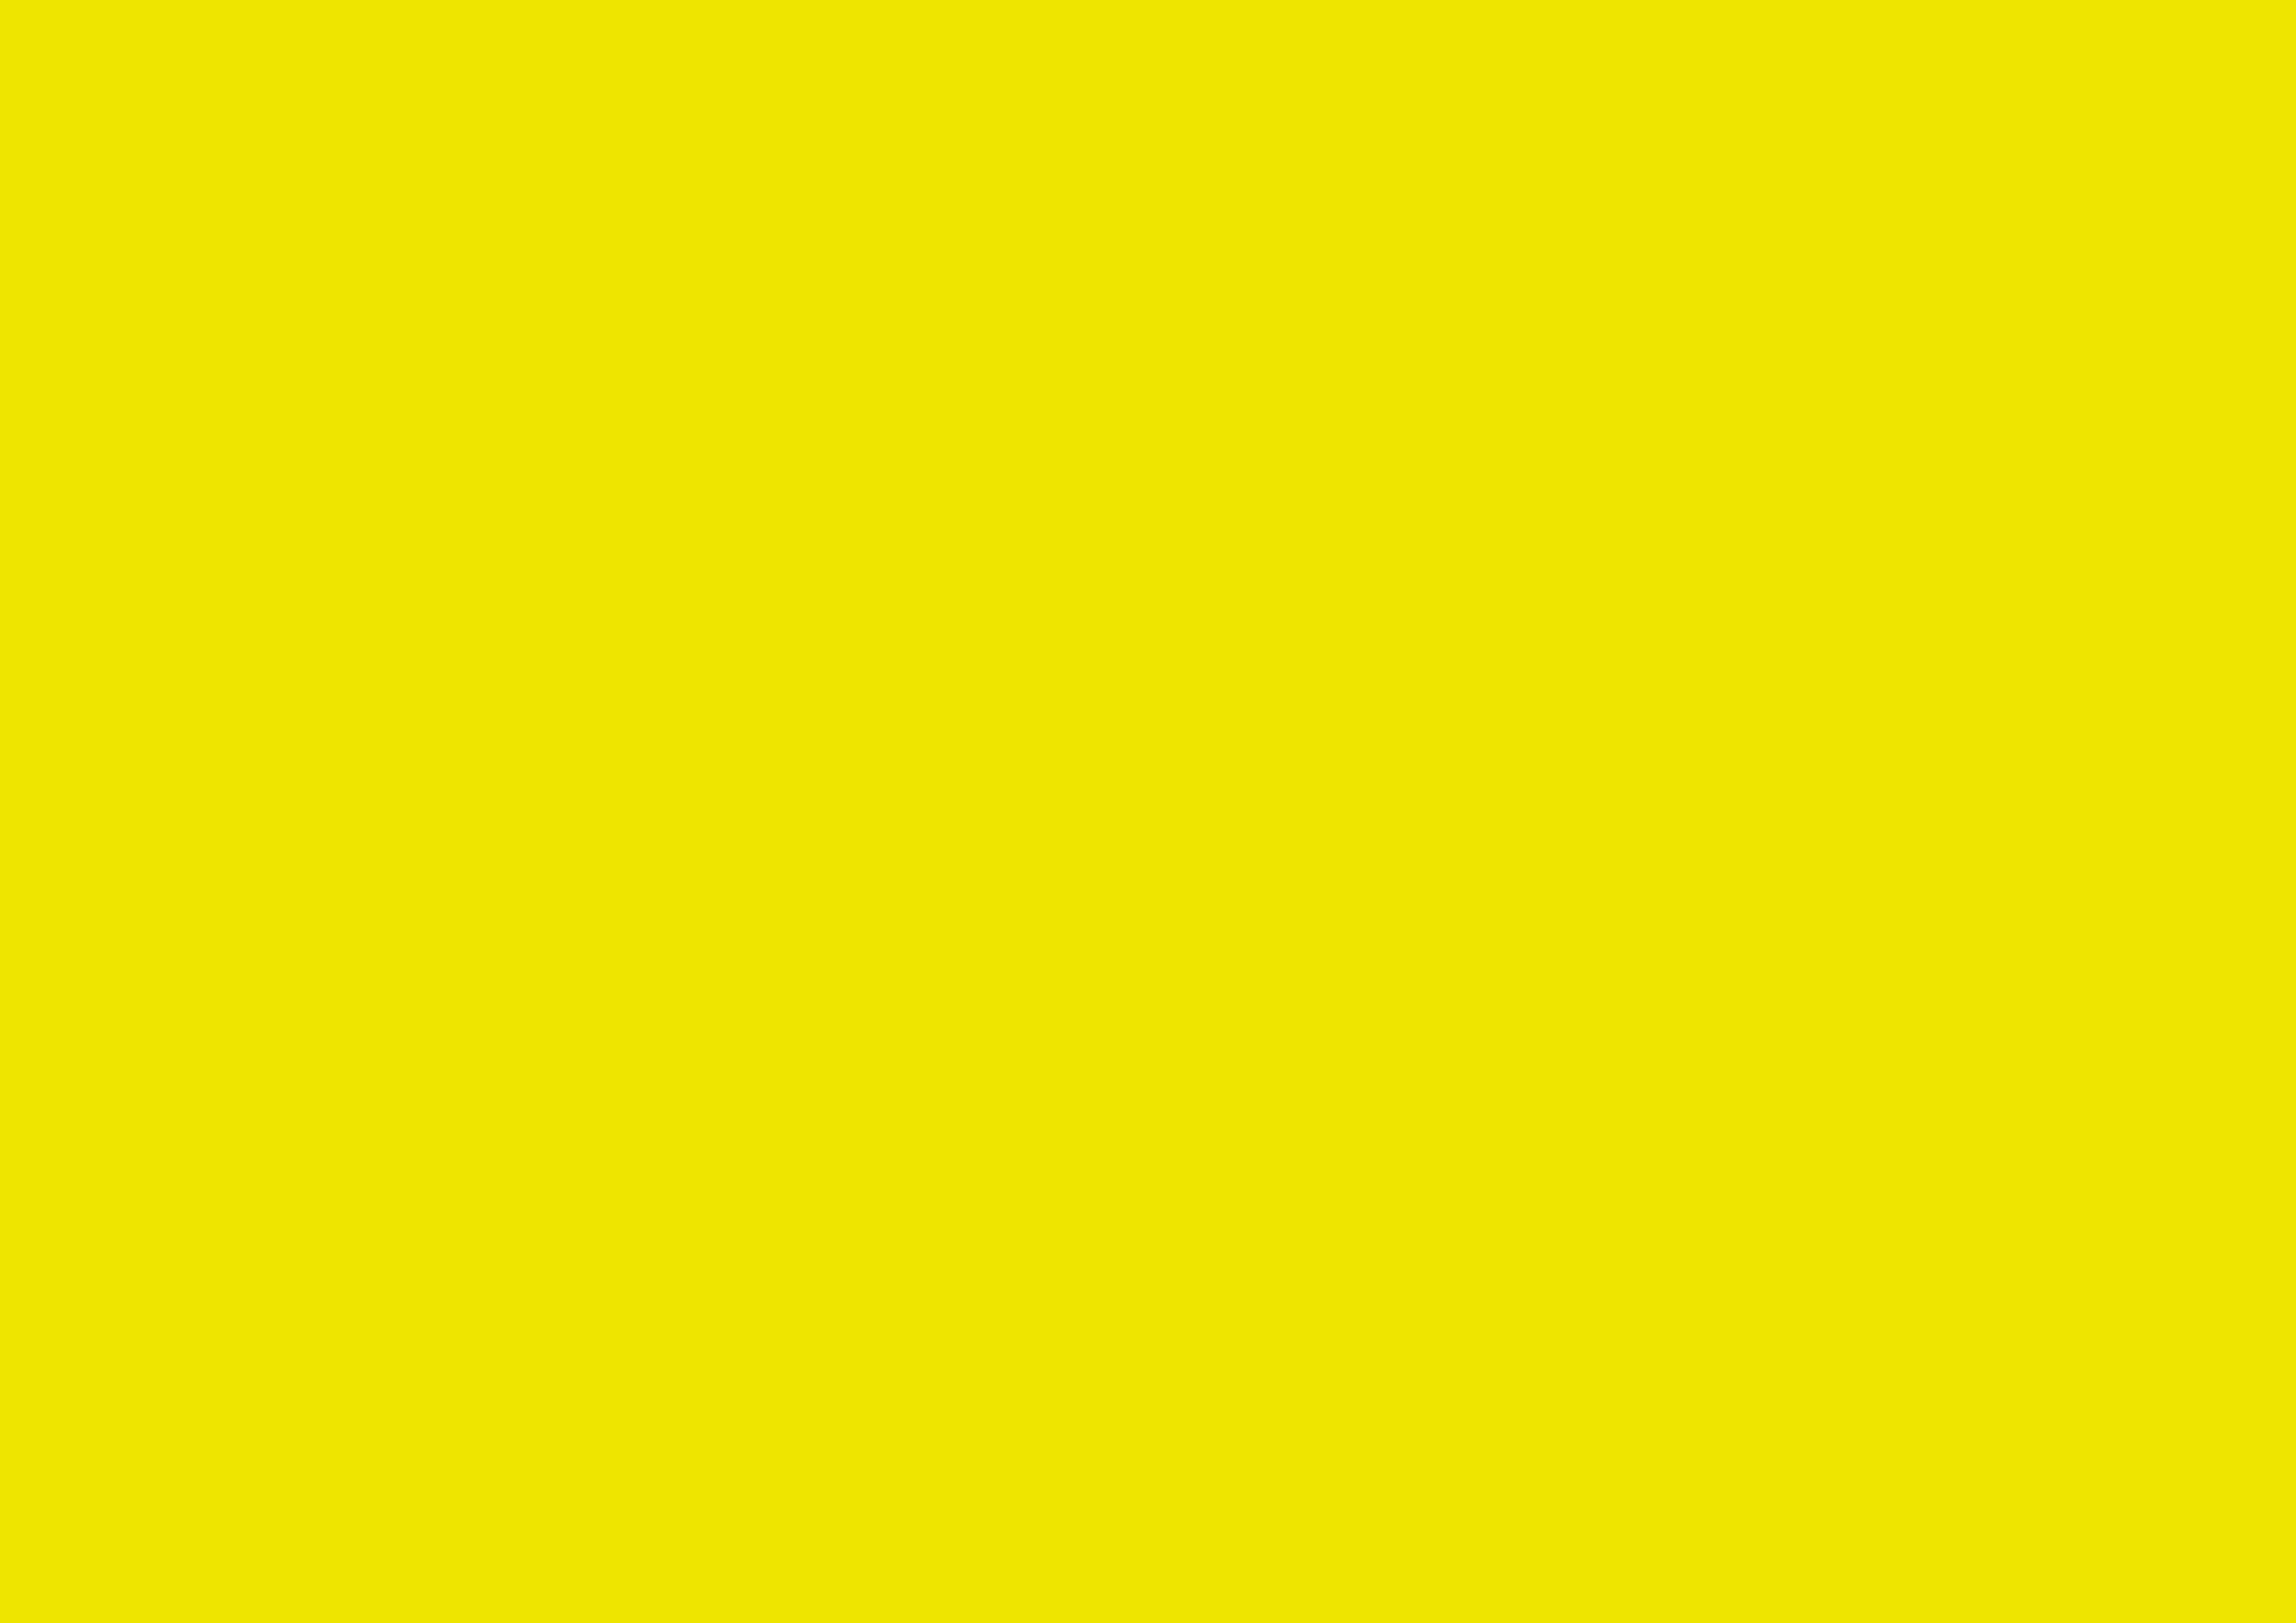 3508x2480 Titanium Yellow Solid Color Background